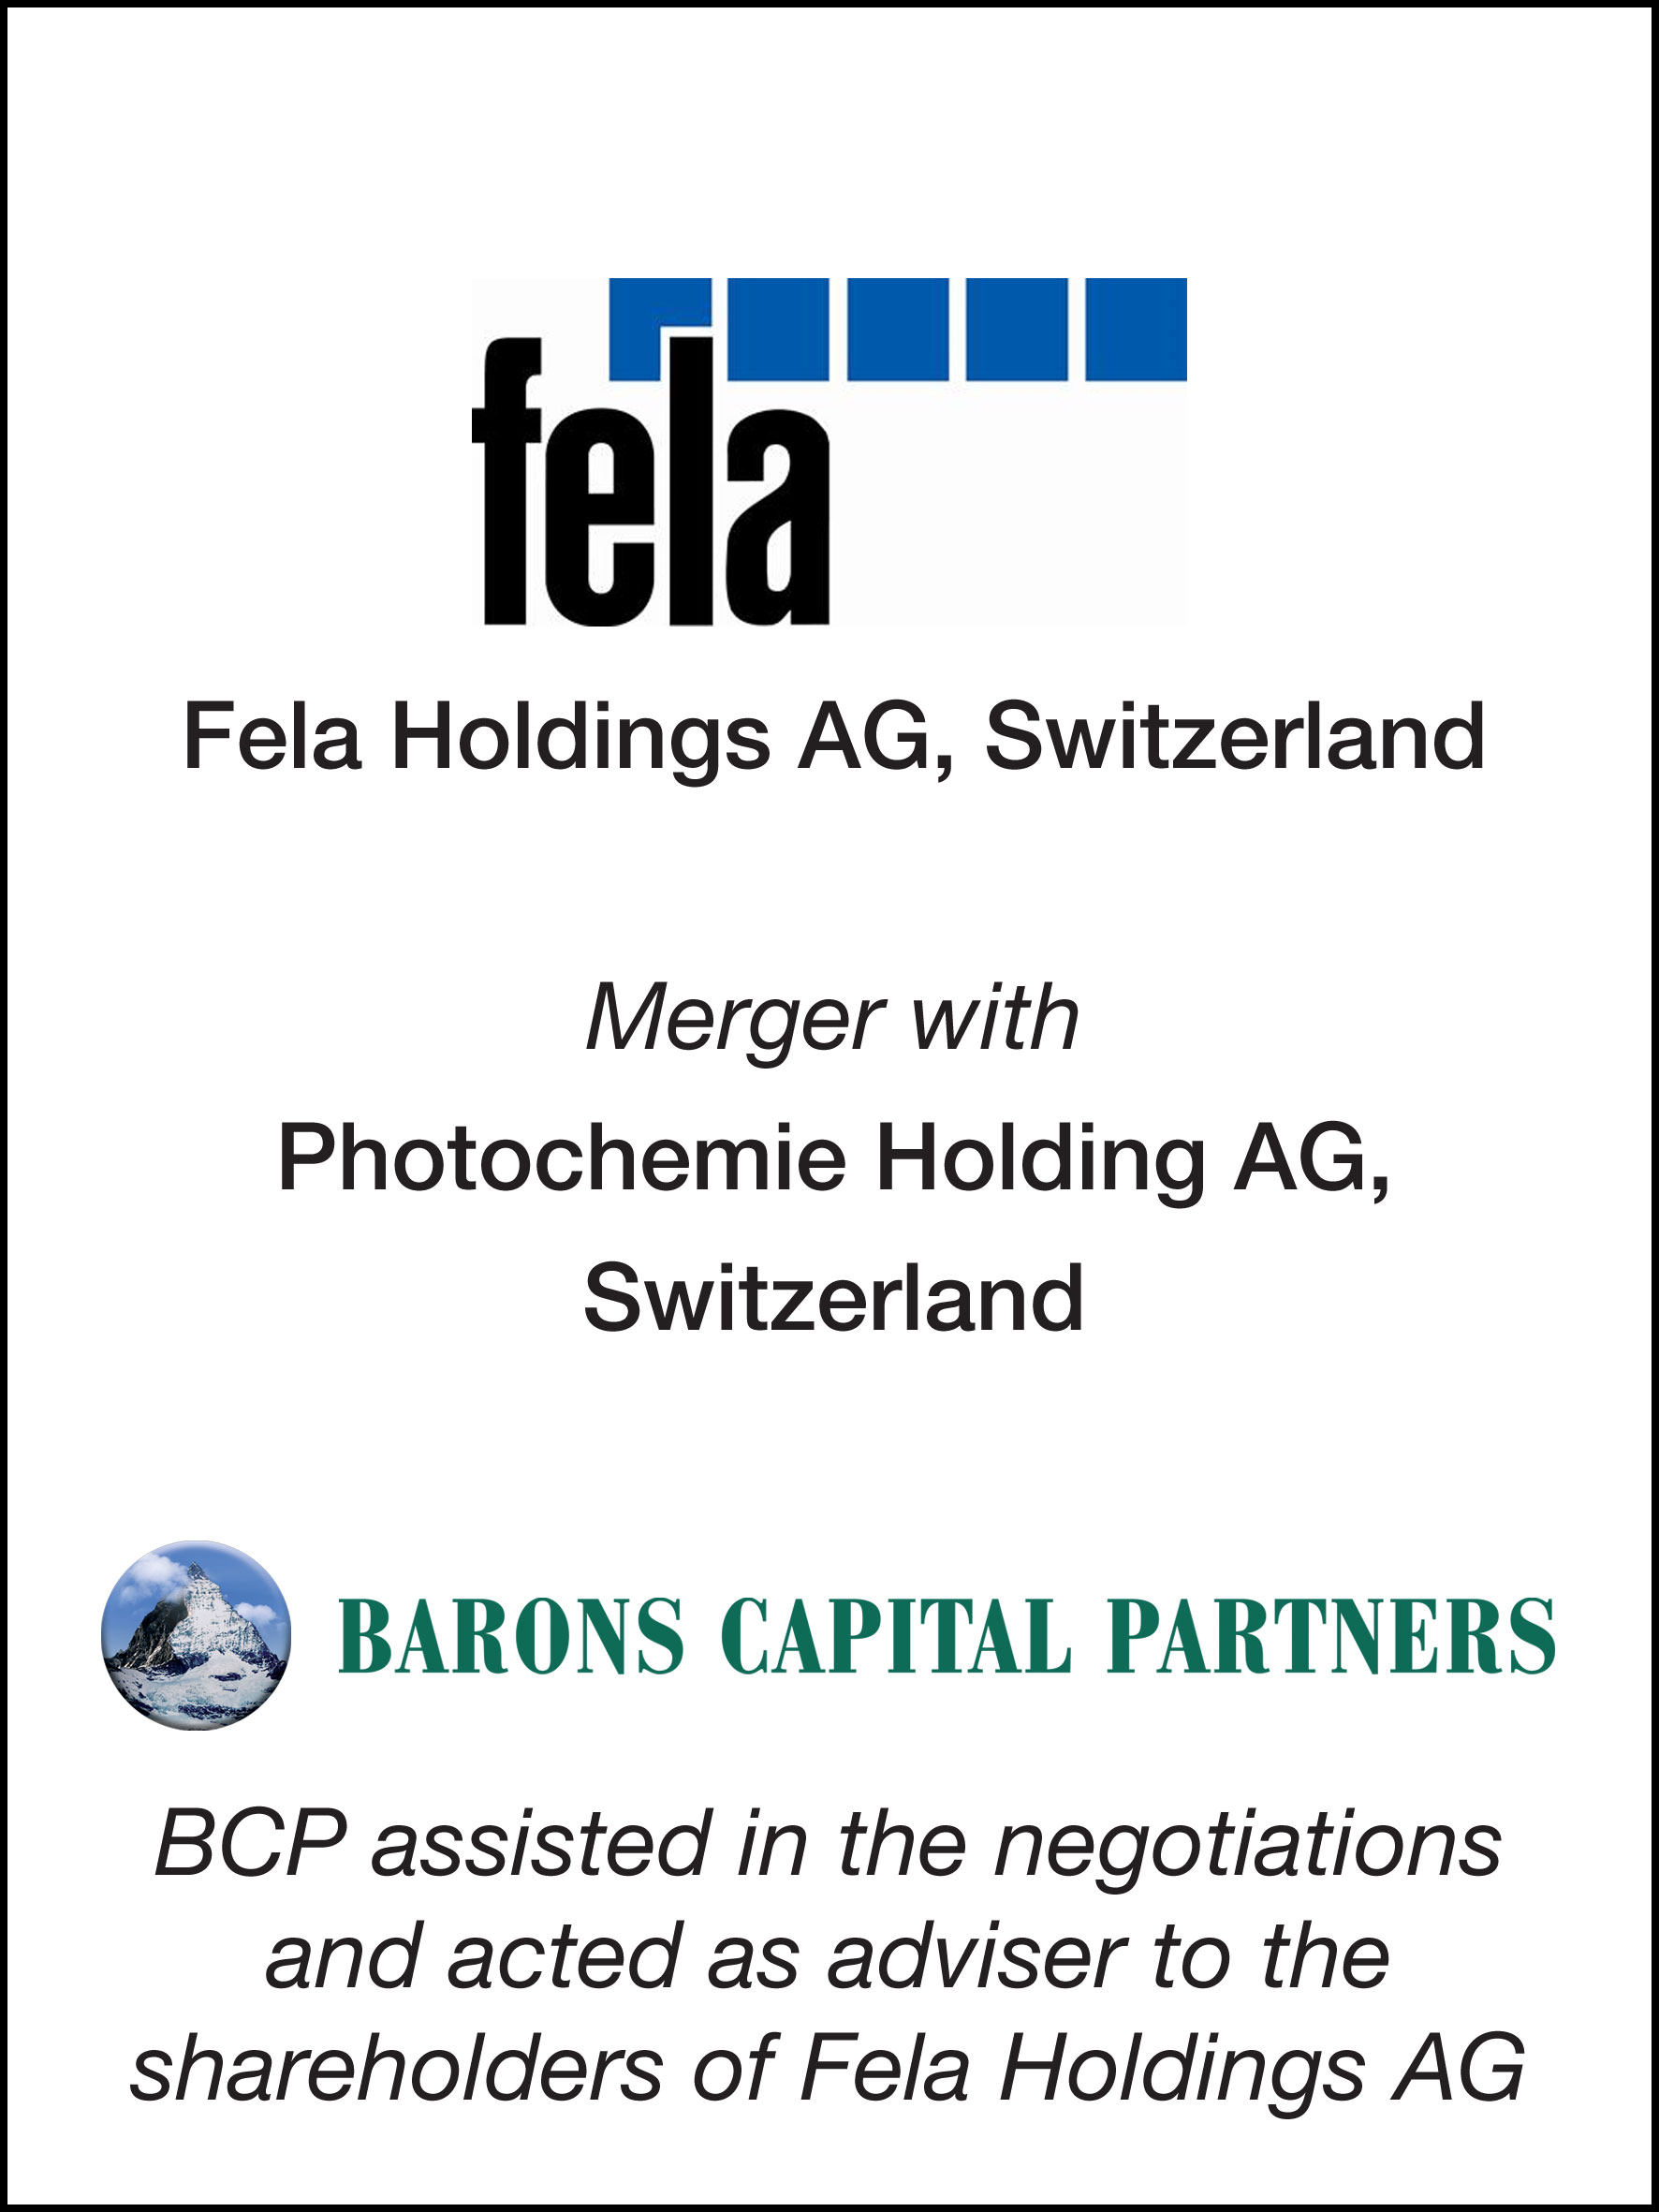 19_Fela Holdings AG